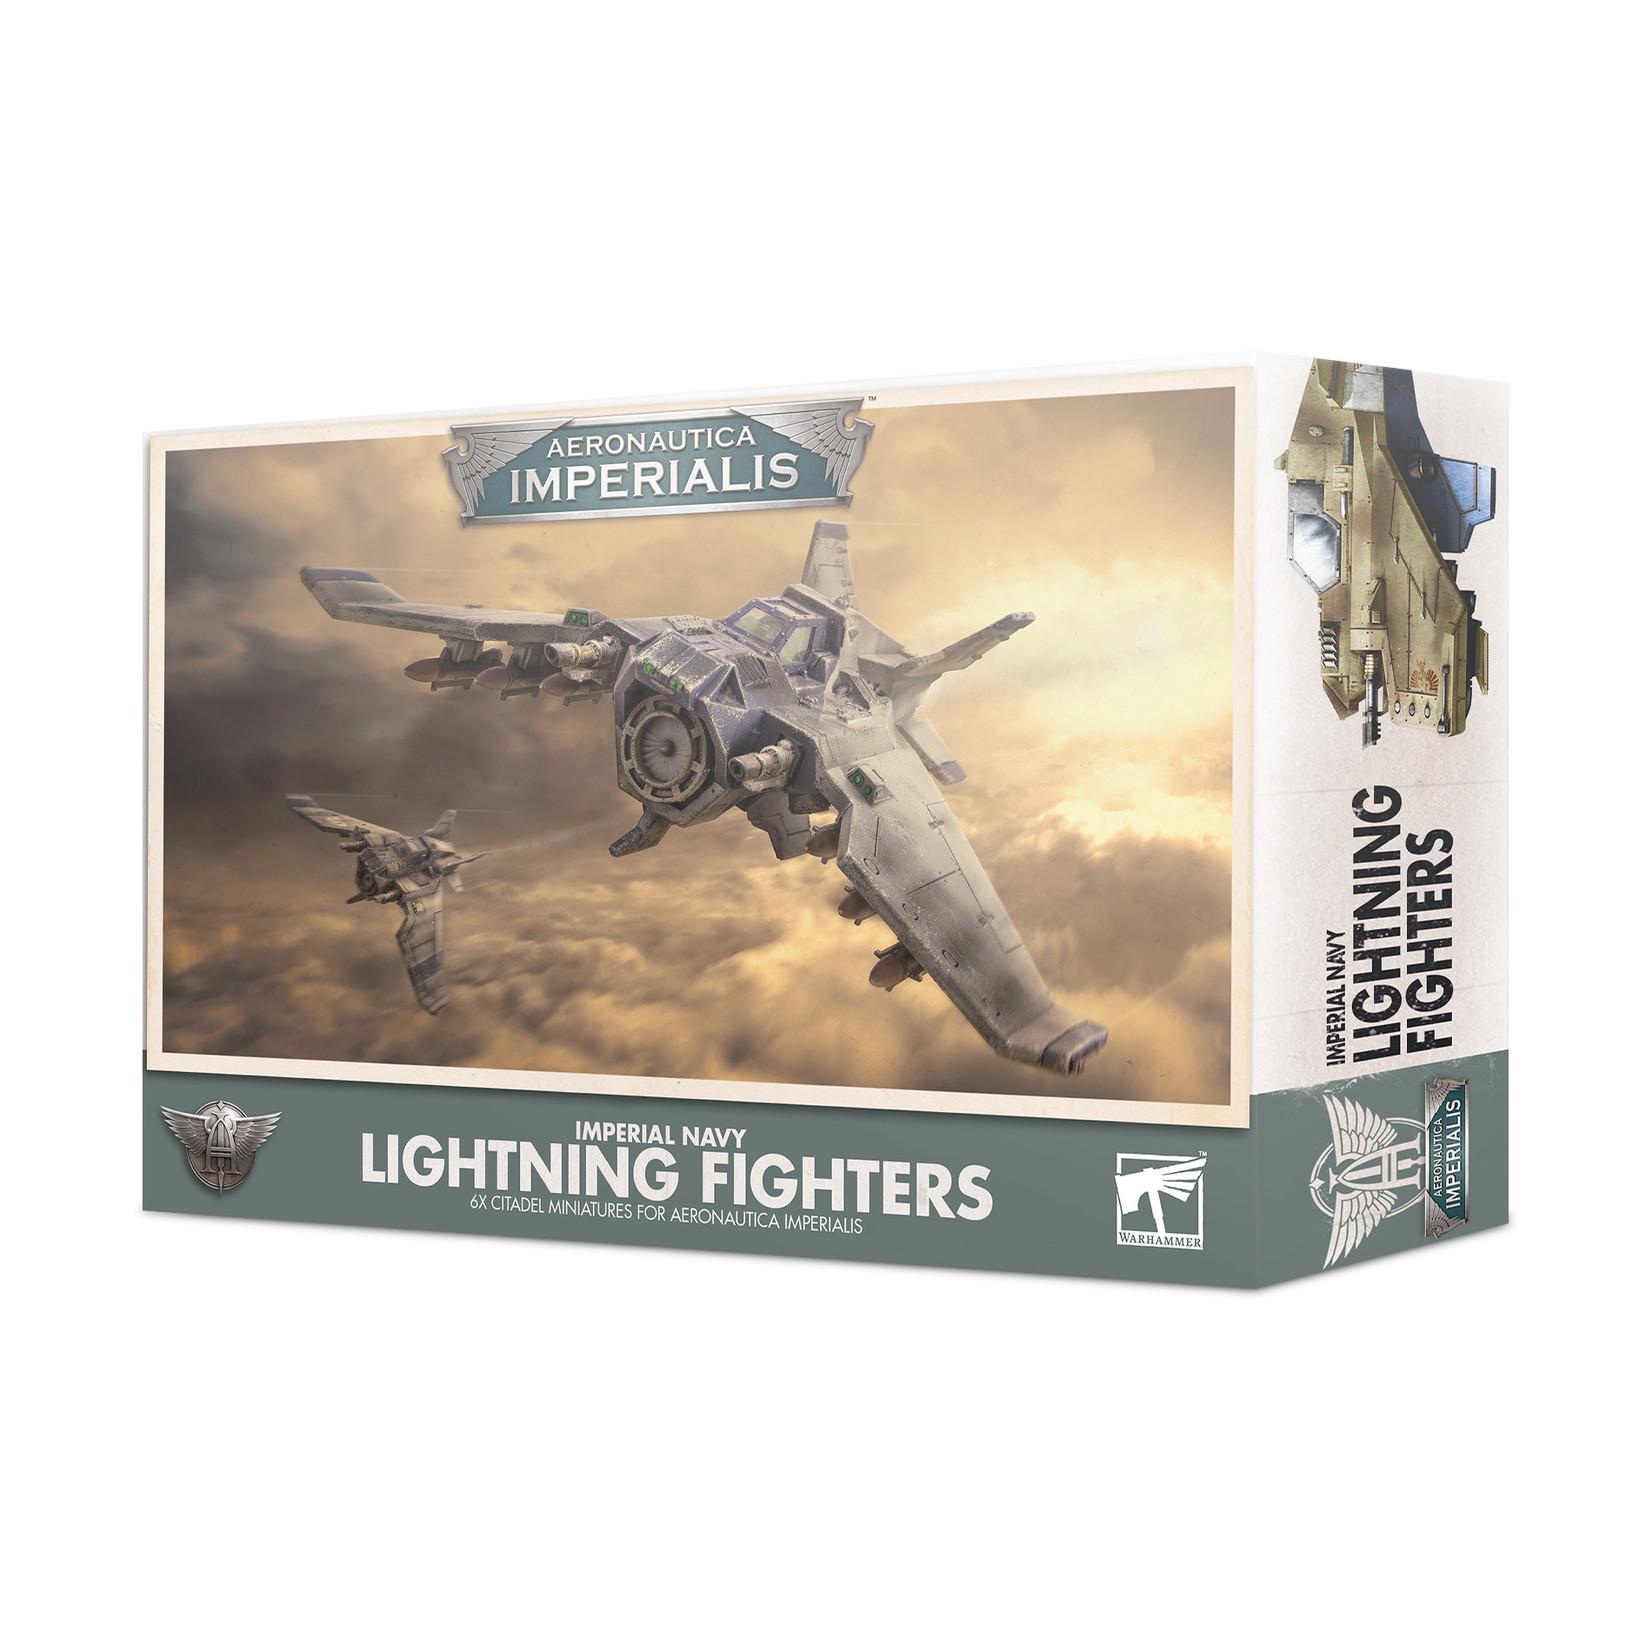 Games Workshop Aeronautica Imperialis: Imperial Navy Lightning Fighters